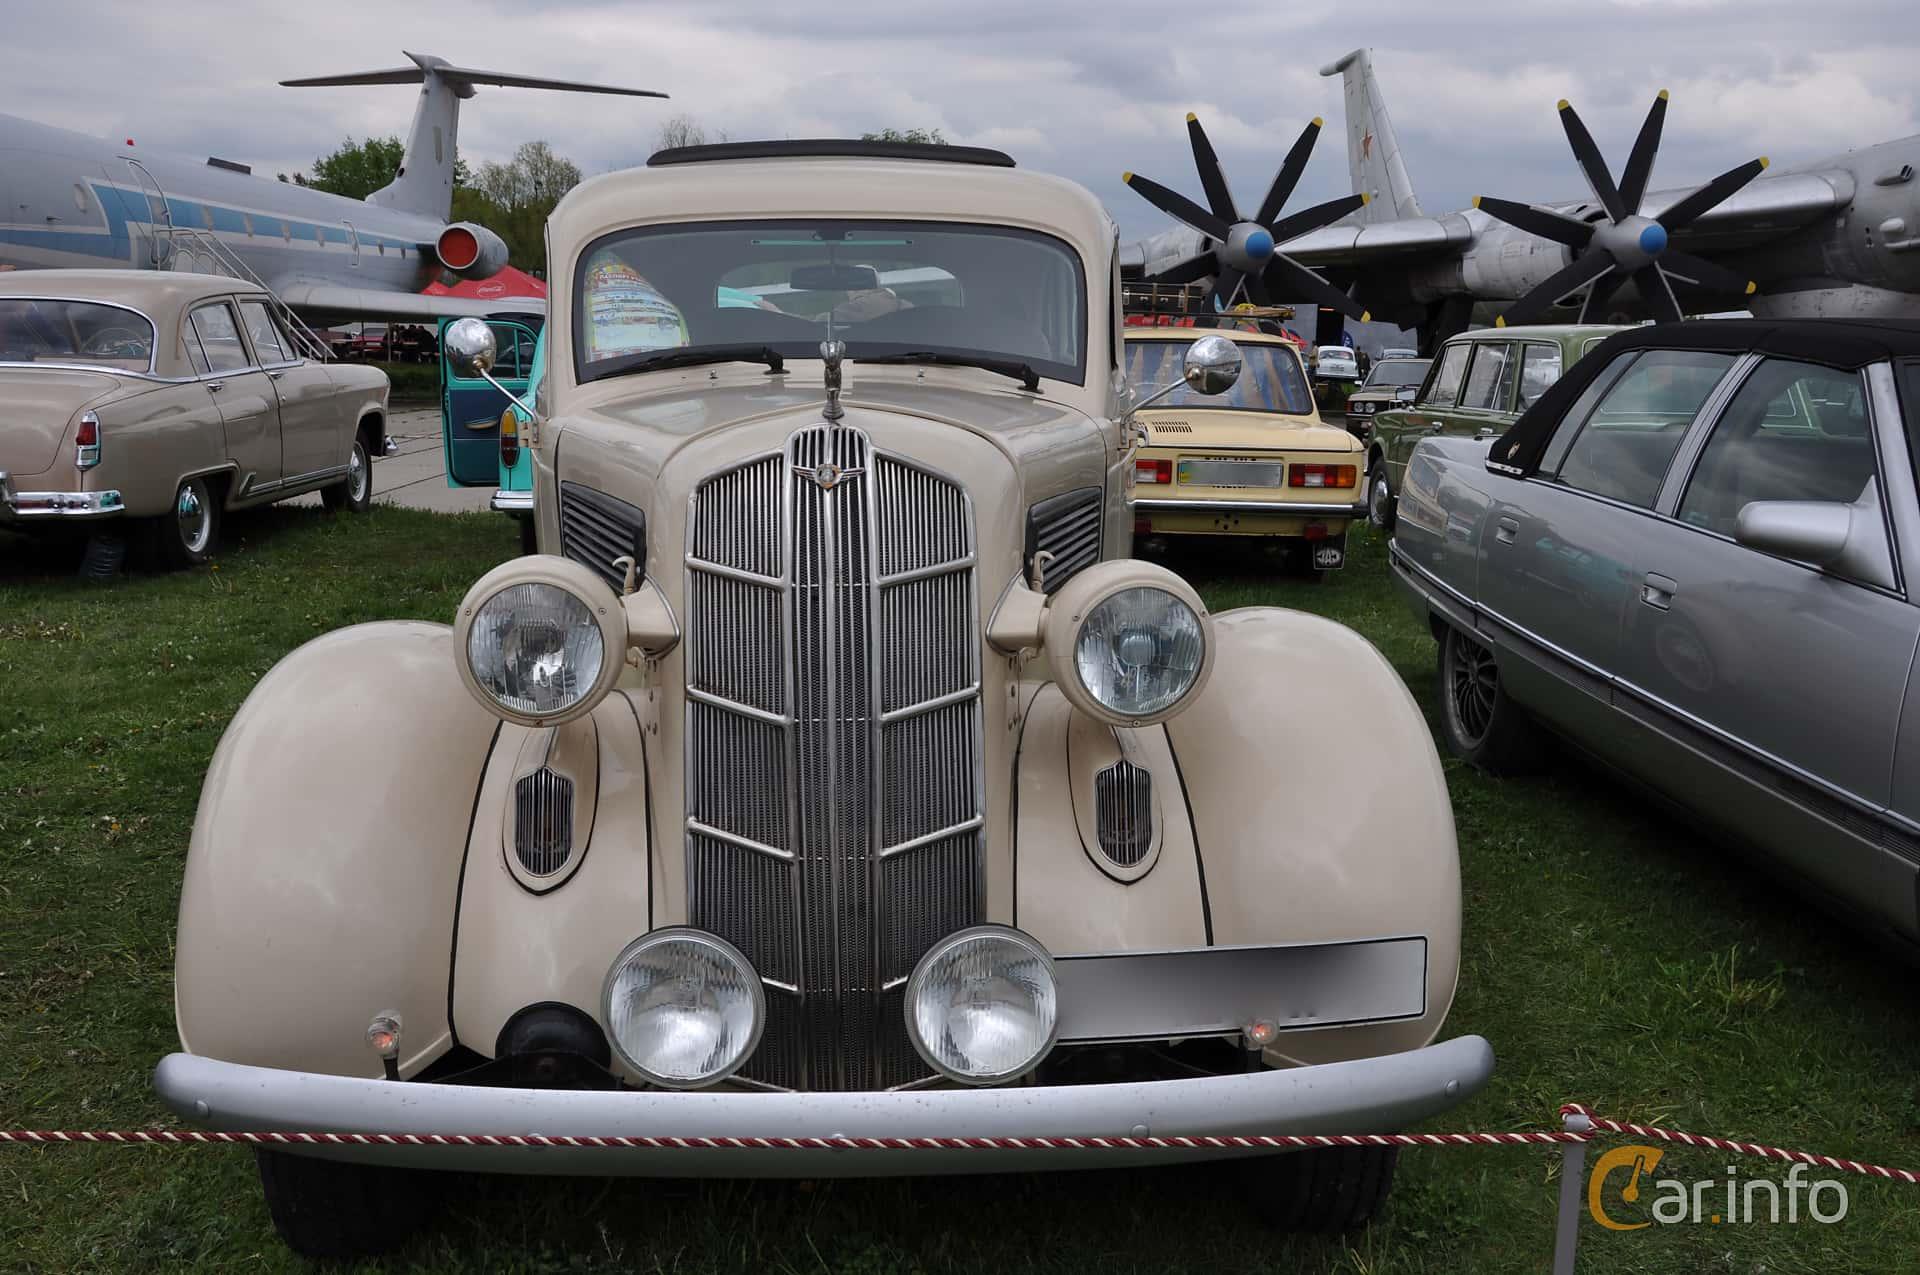 Dodge Beauty Winner 4-door Touring Sedan 3.6 Manual, 87hp, 1936 at Old Car Land no.1 2019